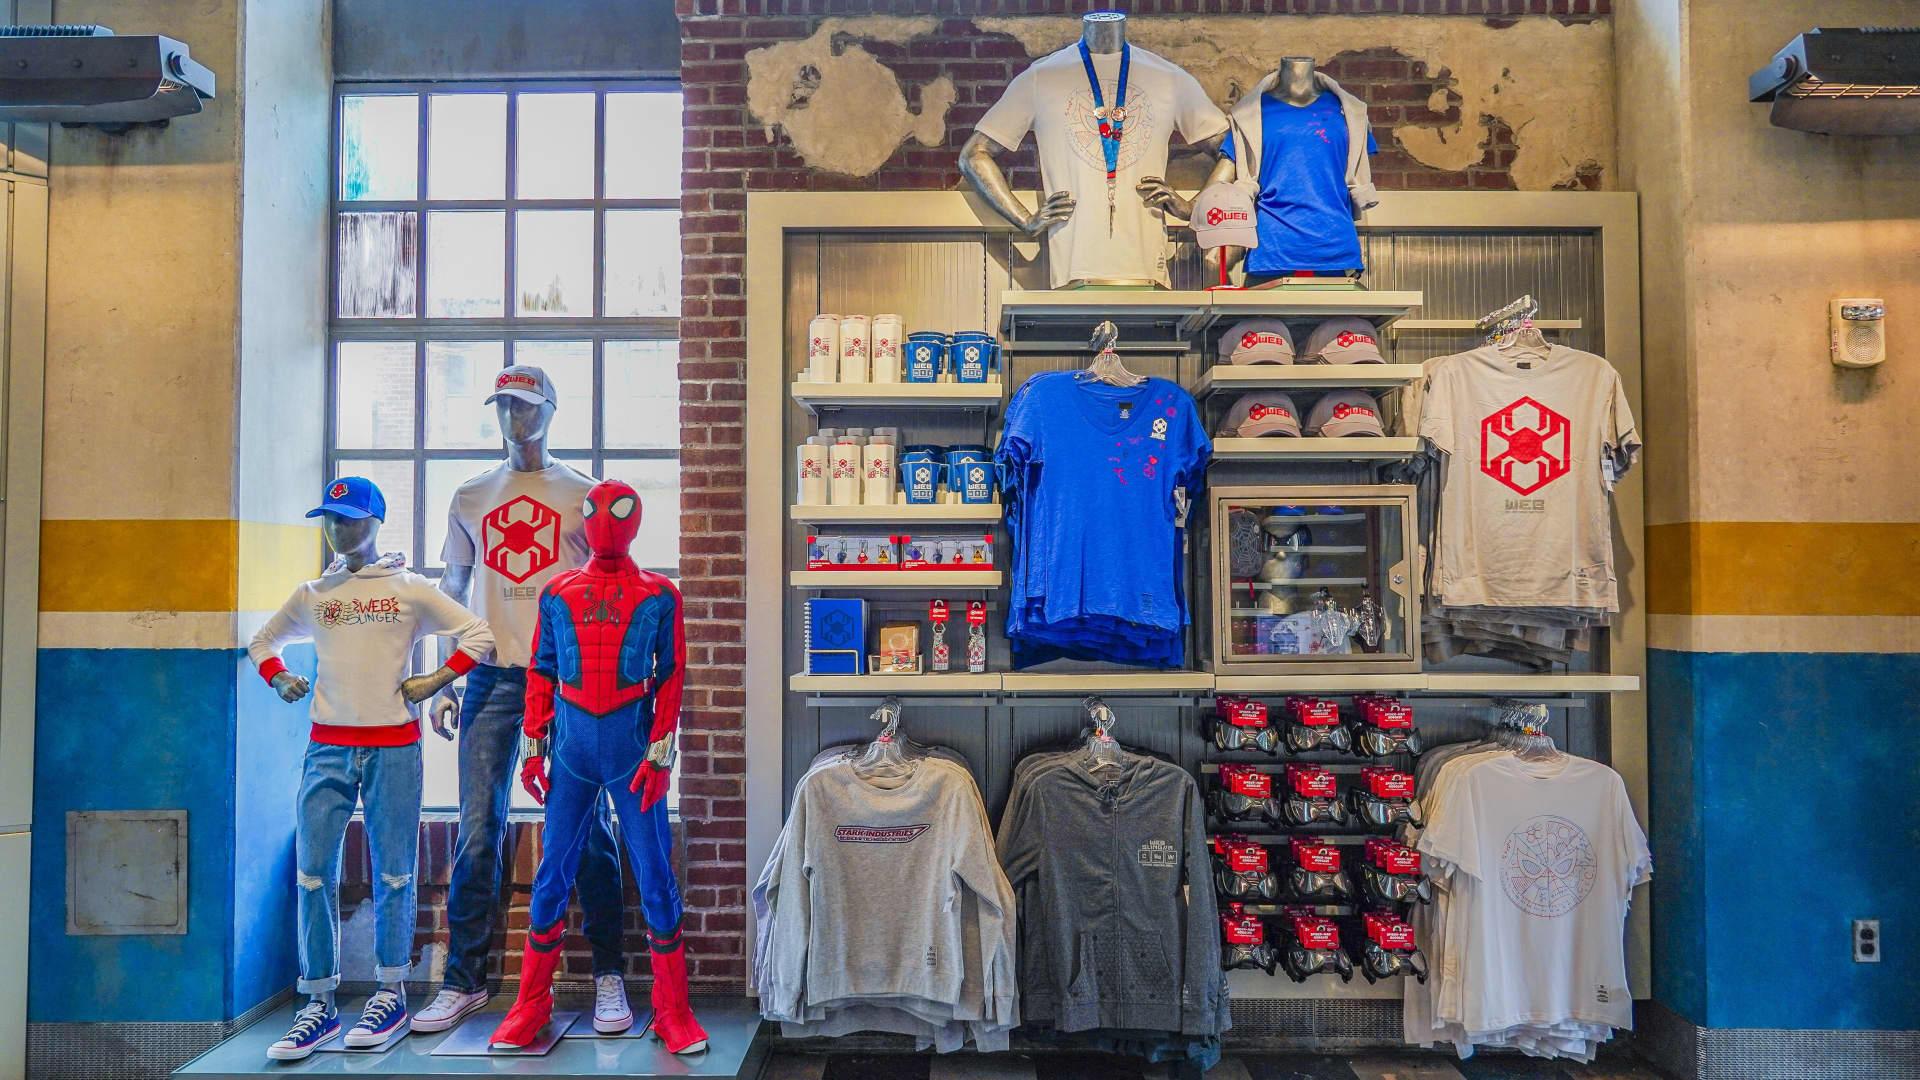 Avengers Campus at Disney California Adventure Park in Anaheim, California, offers exclusive merchandise for superhero recruits.